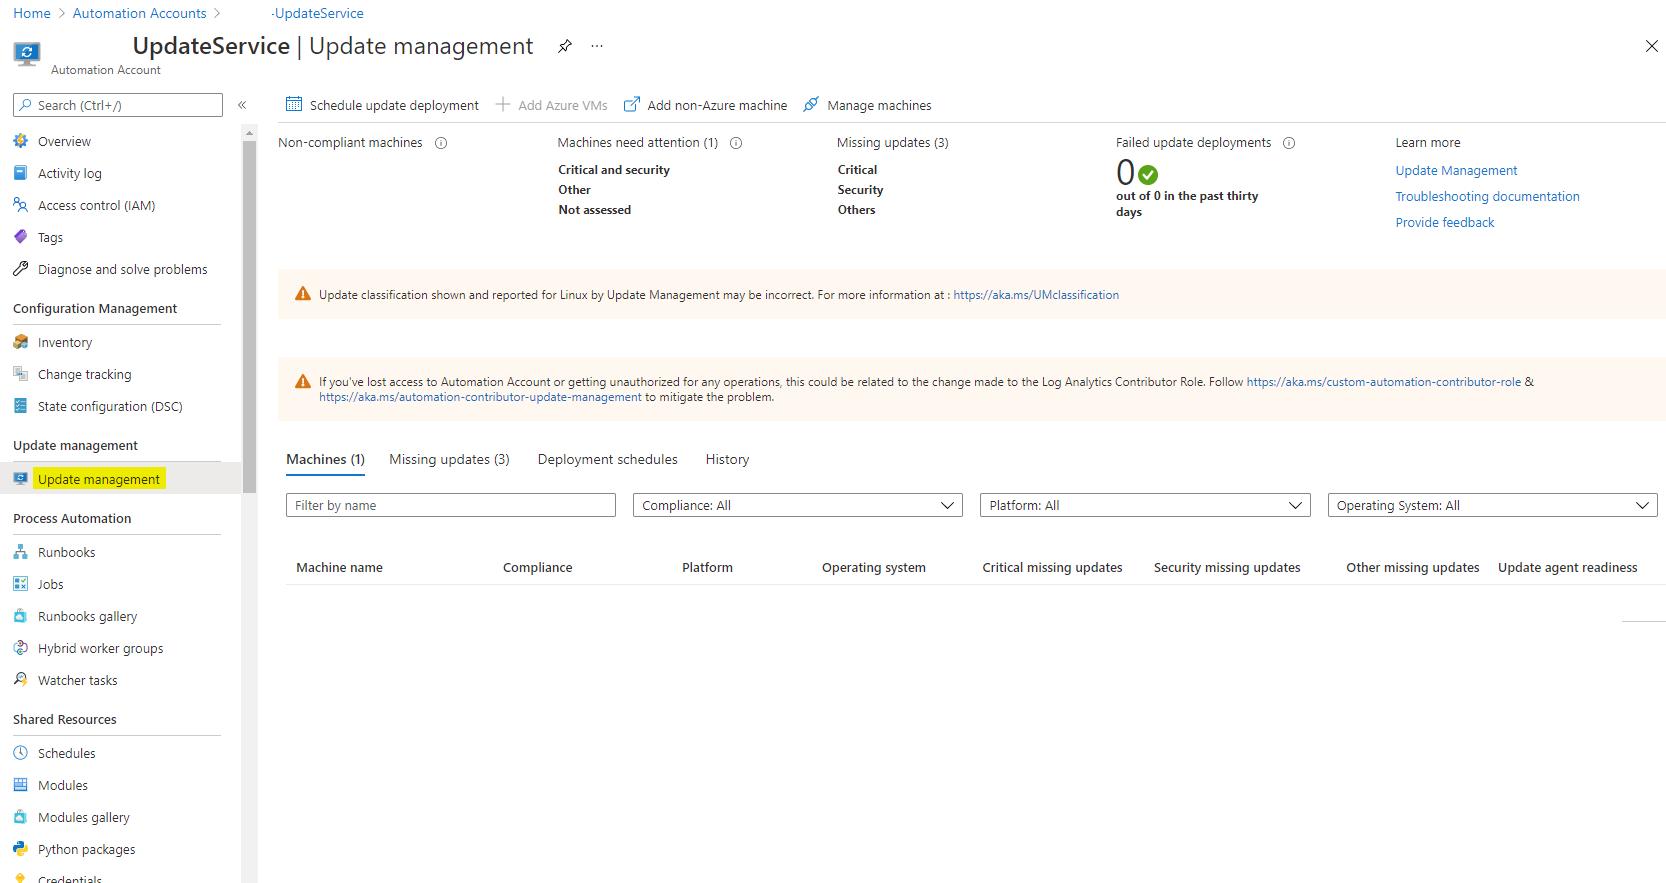 automation-account-update-management-1